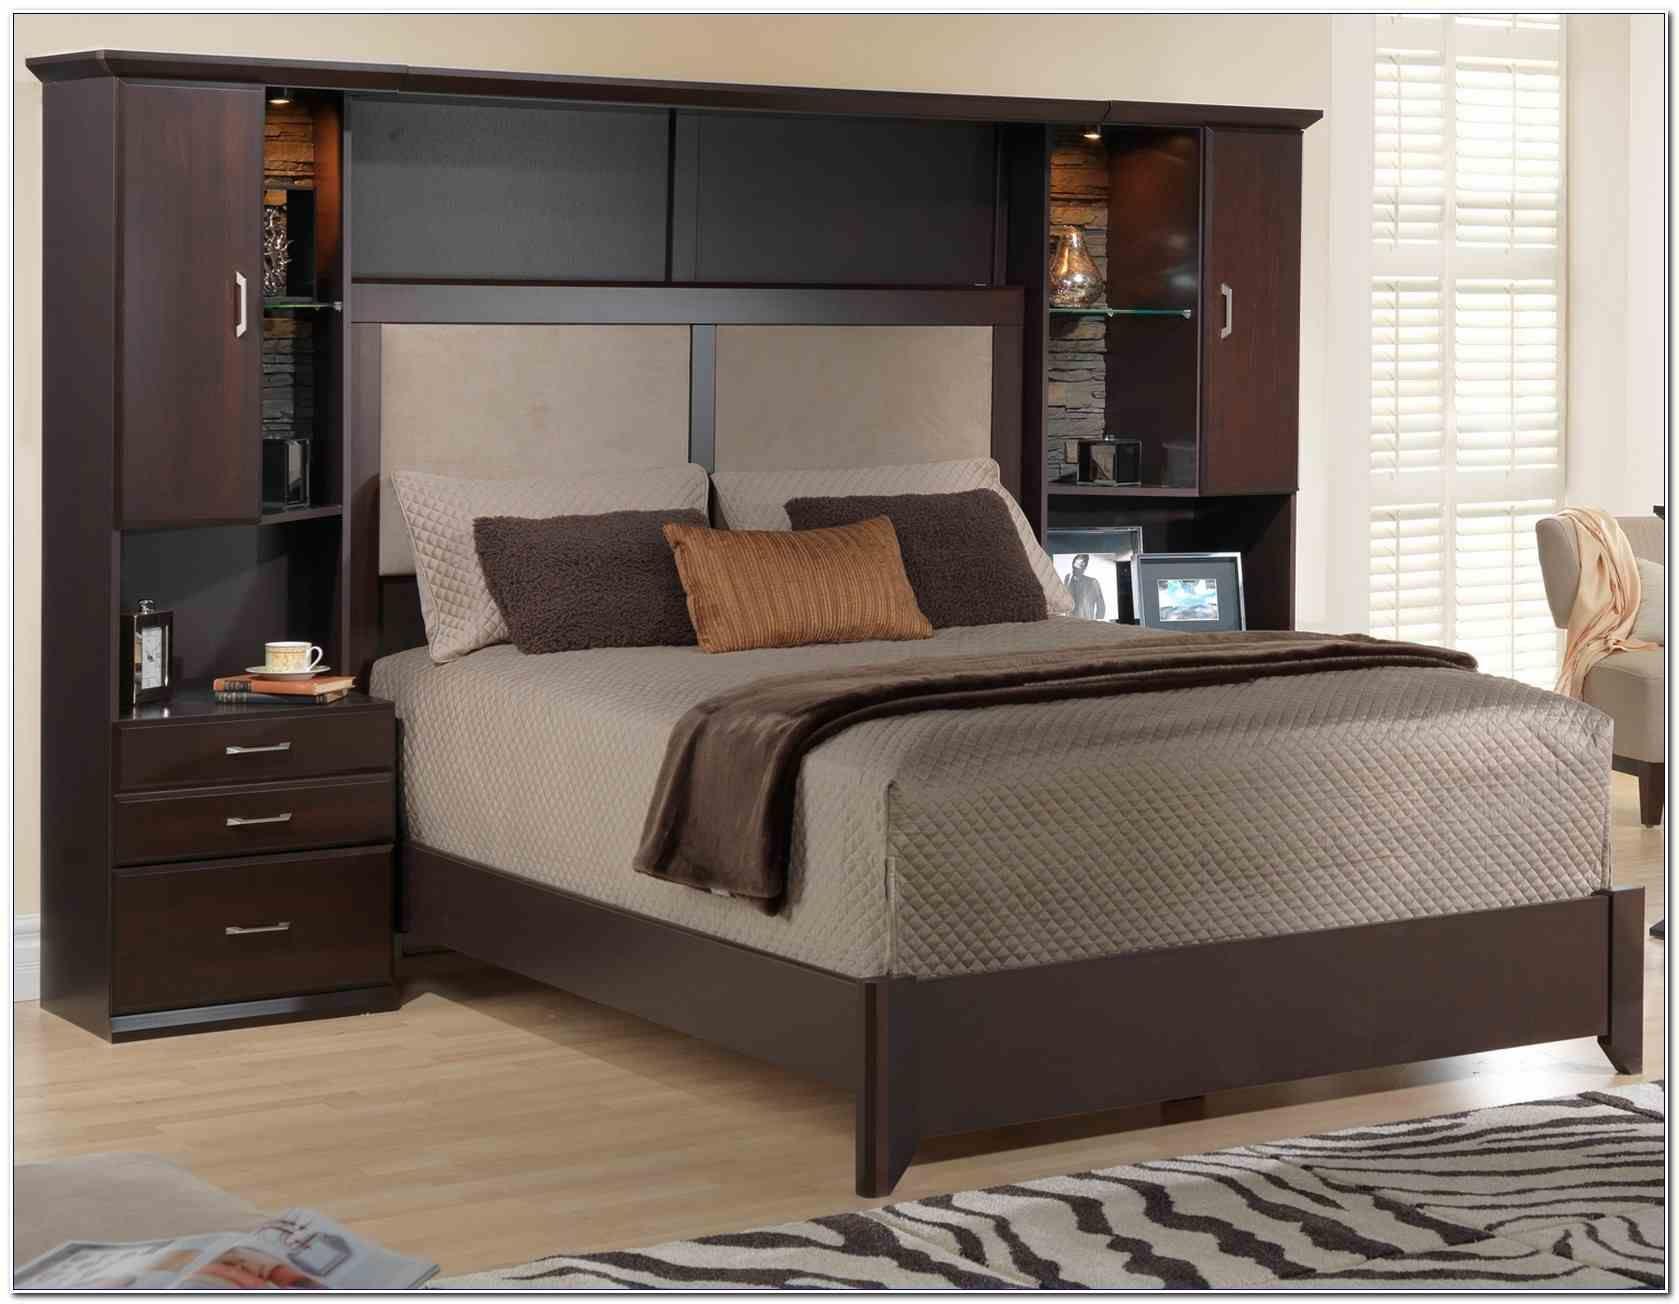 Edenfield King Wall Storage Bed Folio 21 Bedroom Ideas With Regard